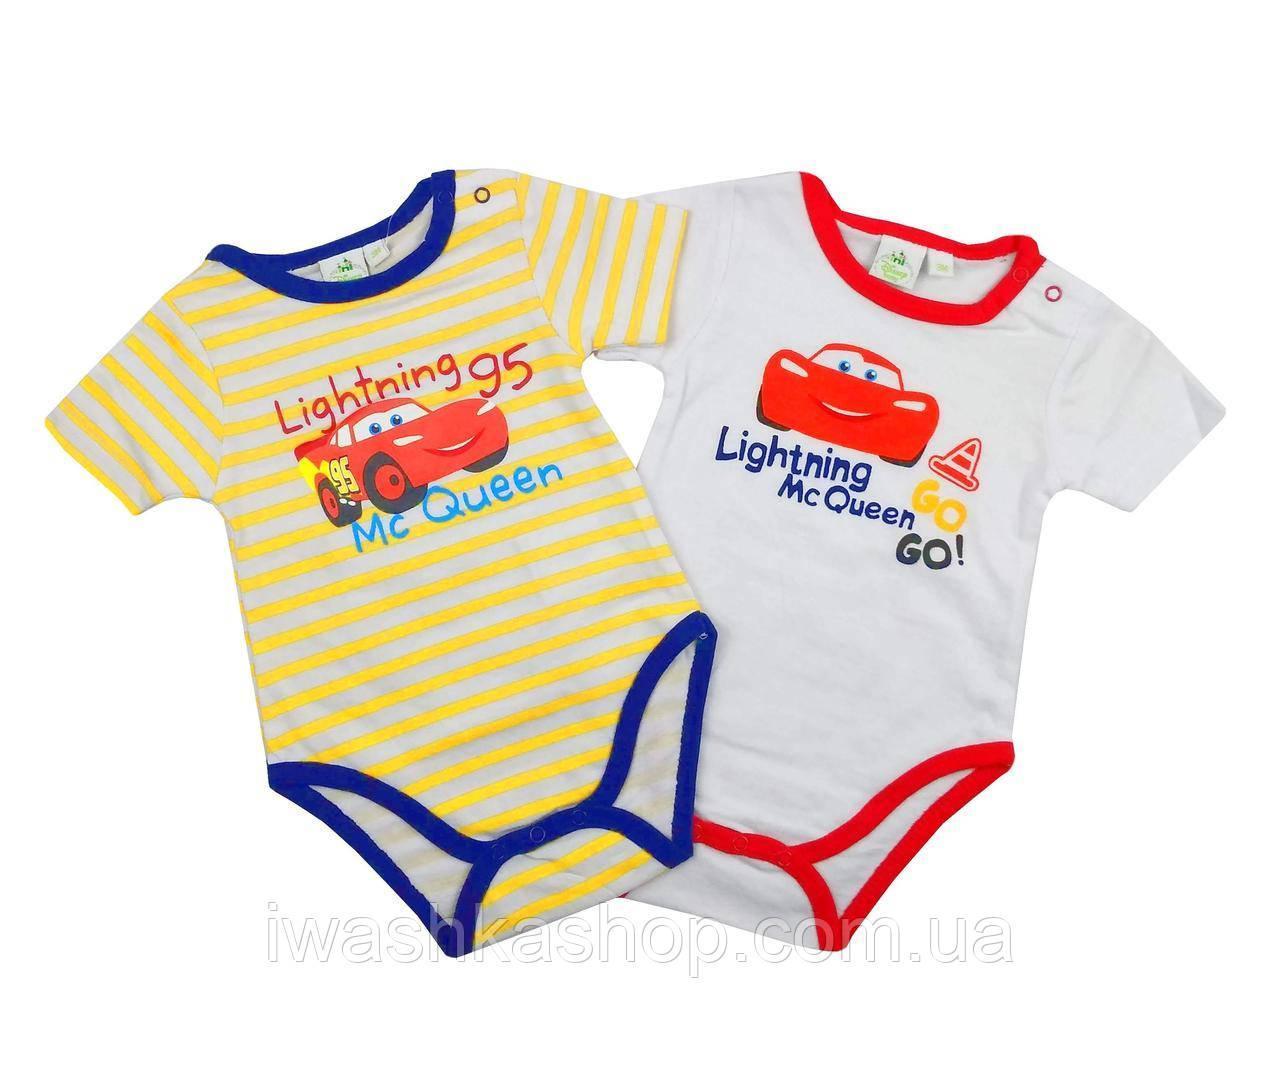 Комплект боди с короткими рукавами Тачки, Cars для мальчика 18 месяцев, р. 81, Disney baby